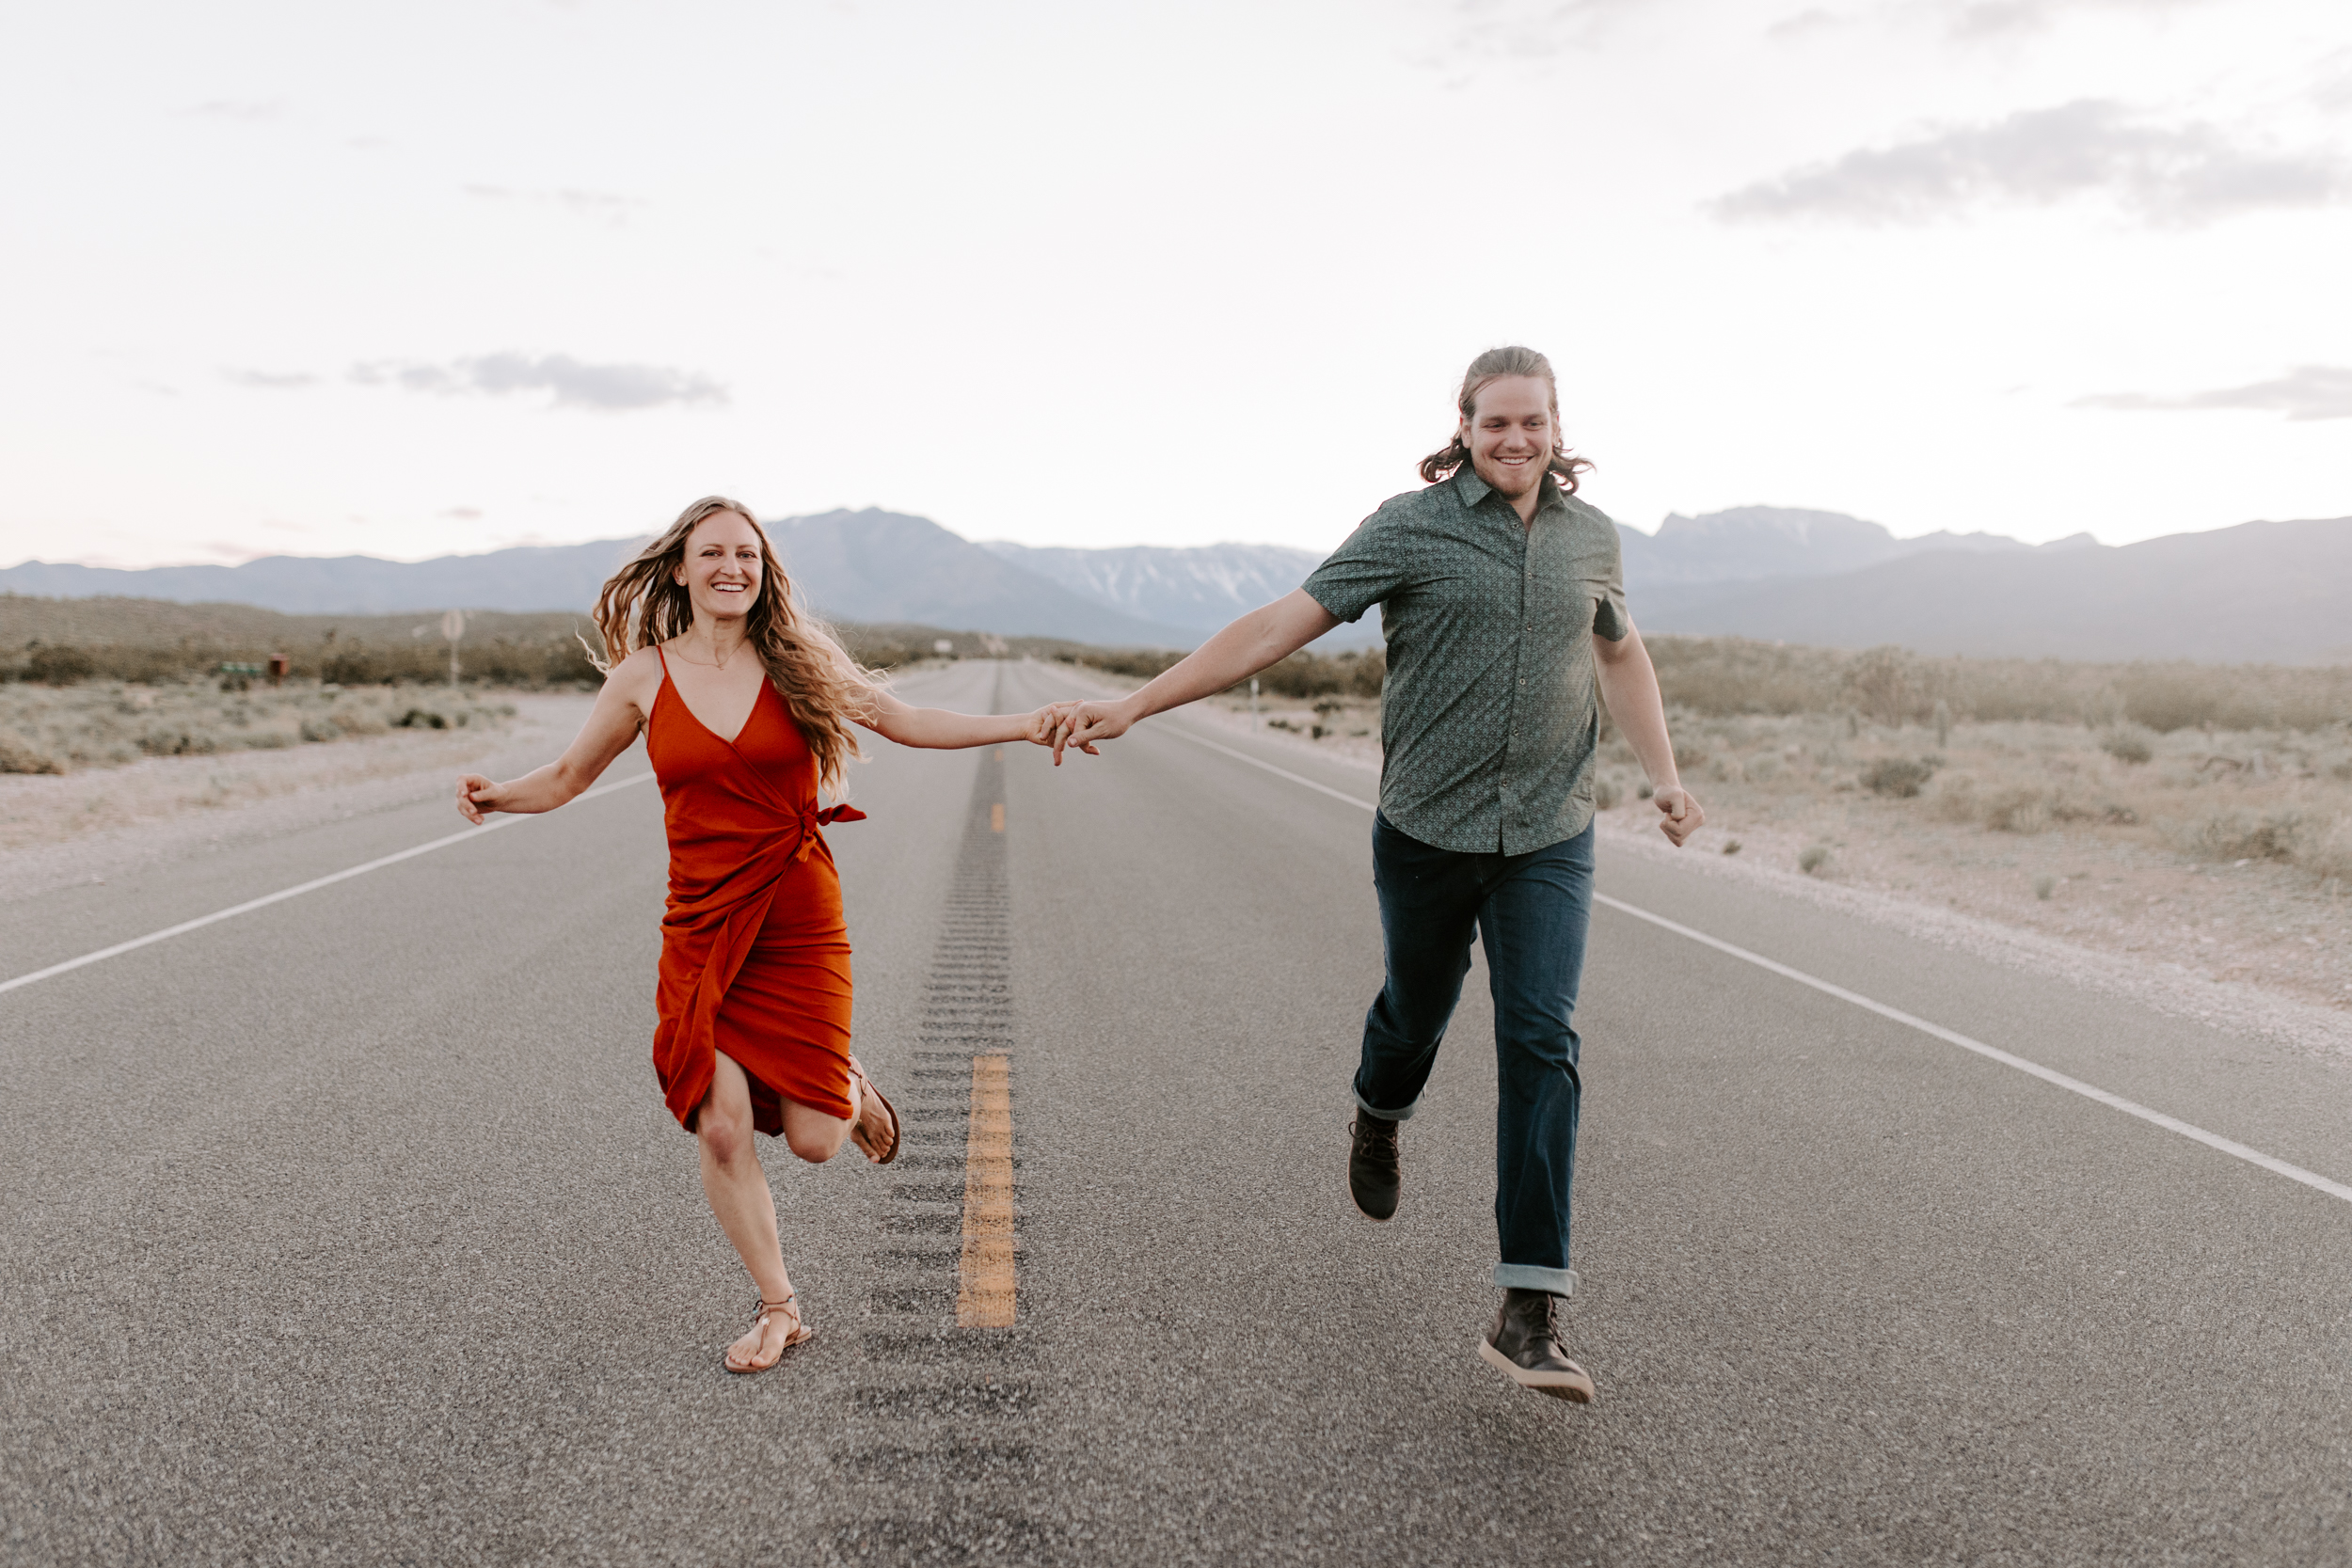 Katelyn Faye Photography | www.katelynfaye.com | Las Vegas Engagement | Mt. Charleston Engagement Session | T&S-59.jpg